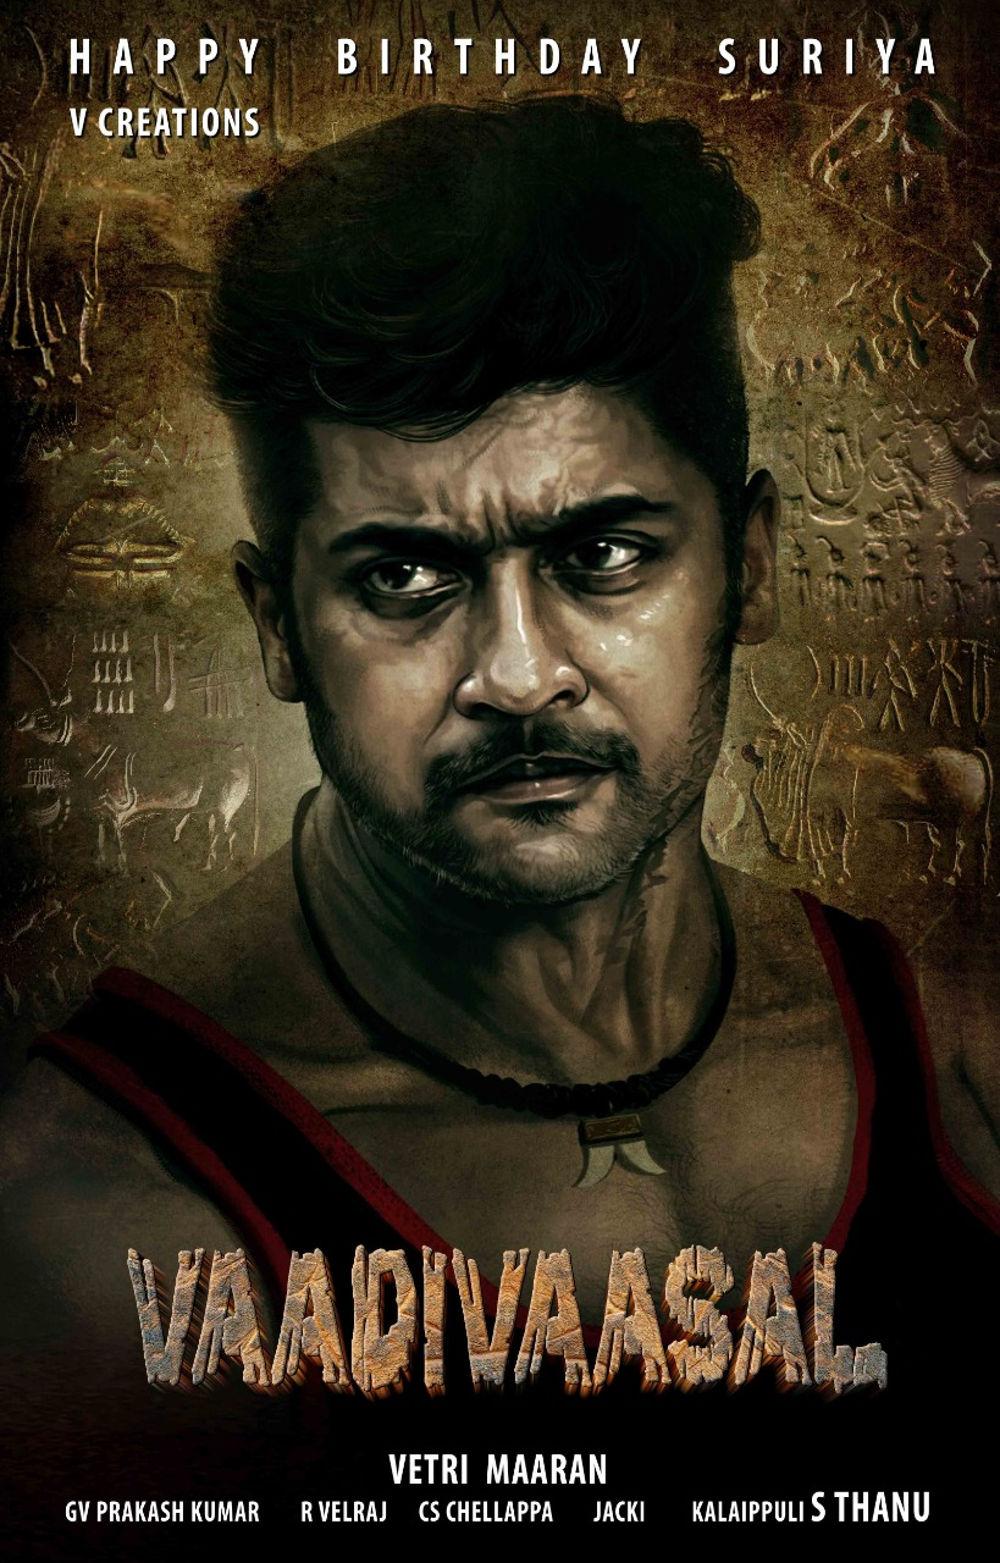 Suriya Vaadivasal Movie First Look Poster